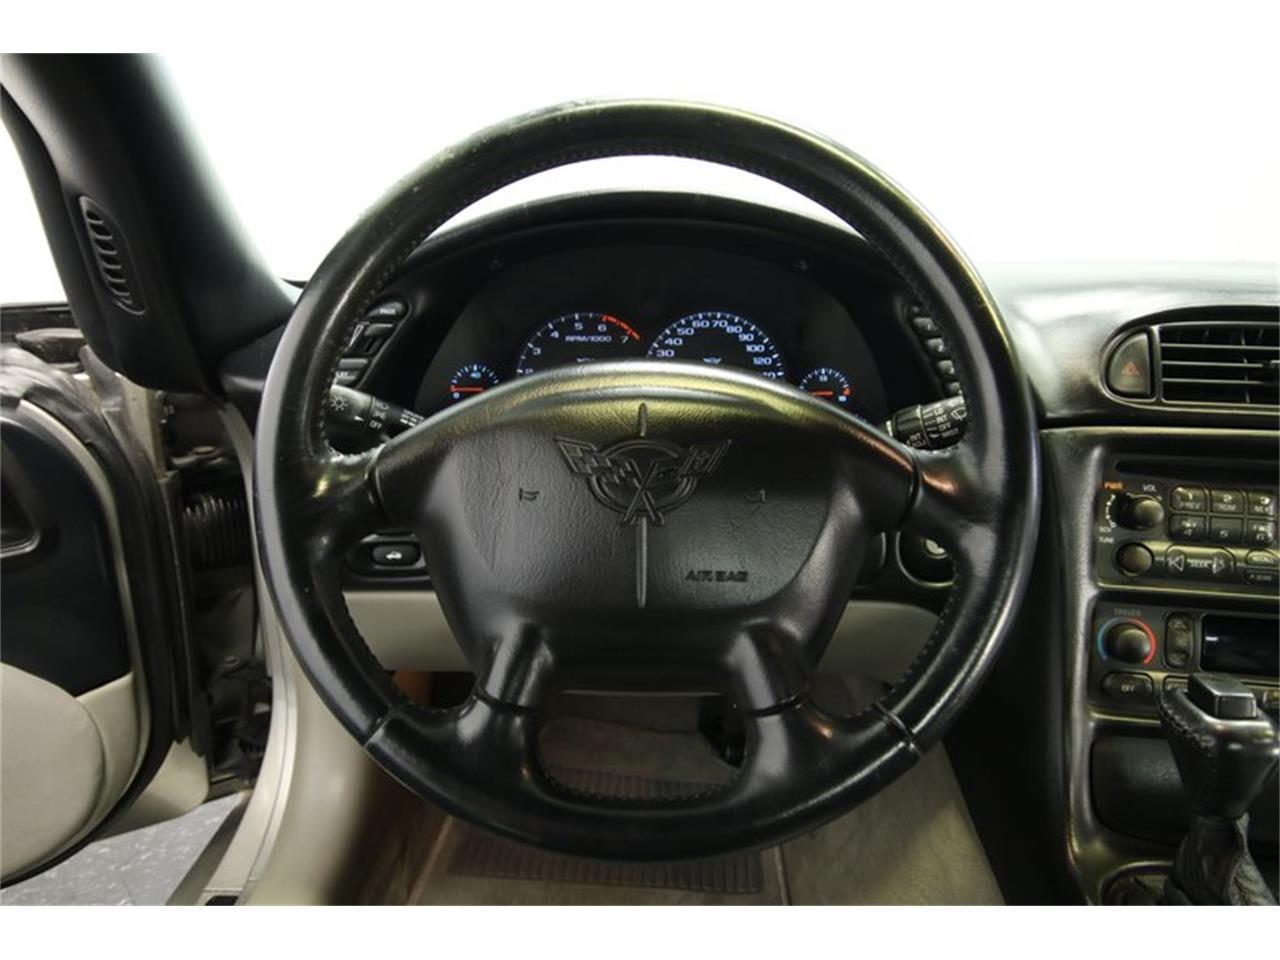 2000 Chevrolet Corvette (CC-1421288) for sale in Lutz, Florida